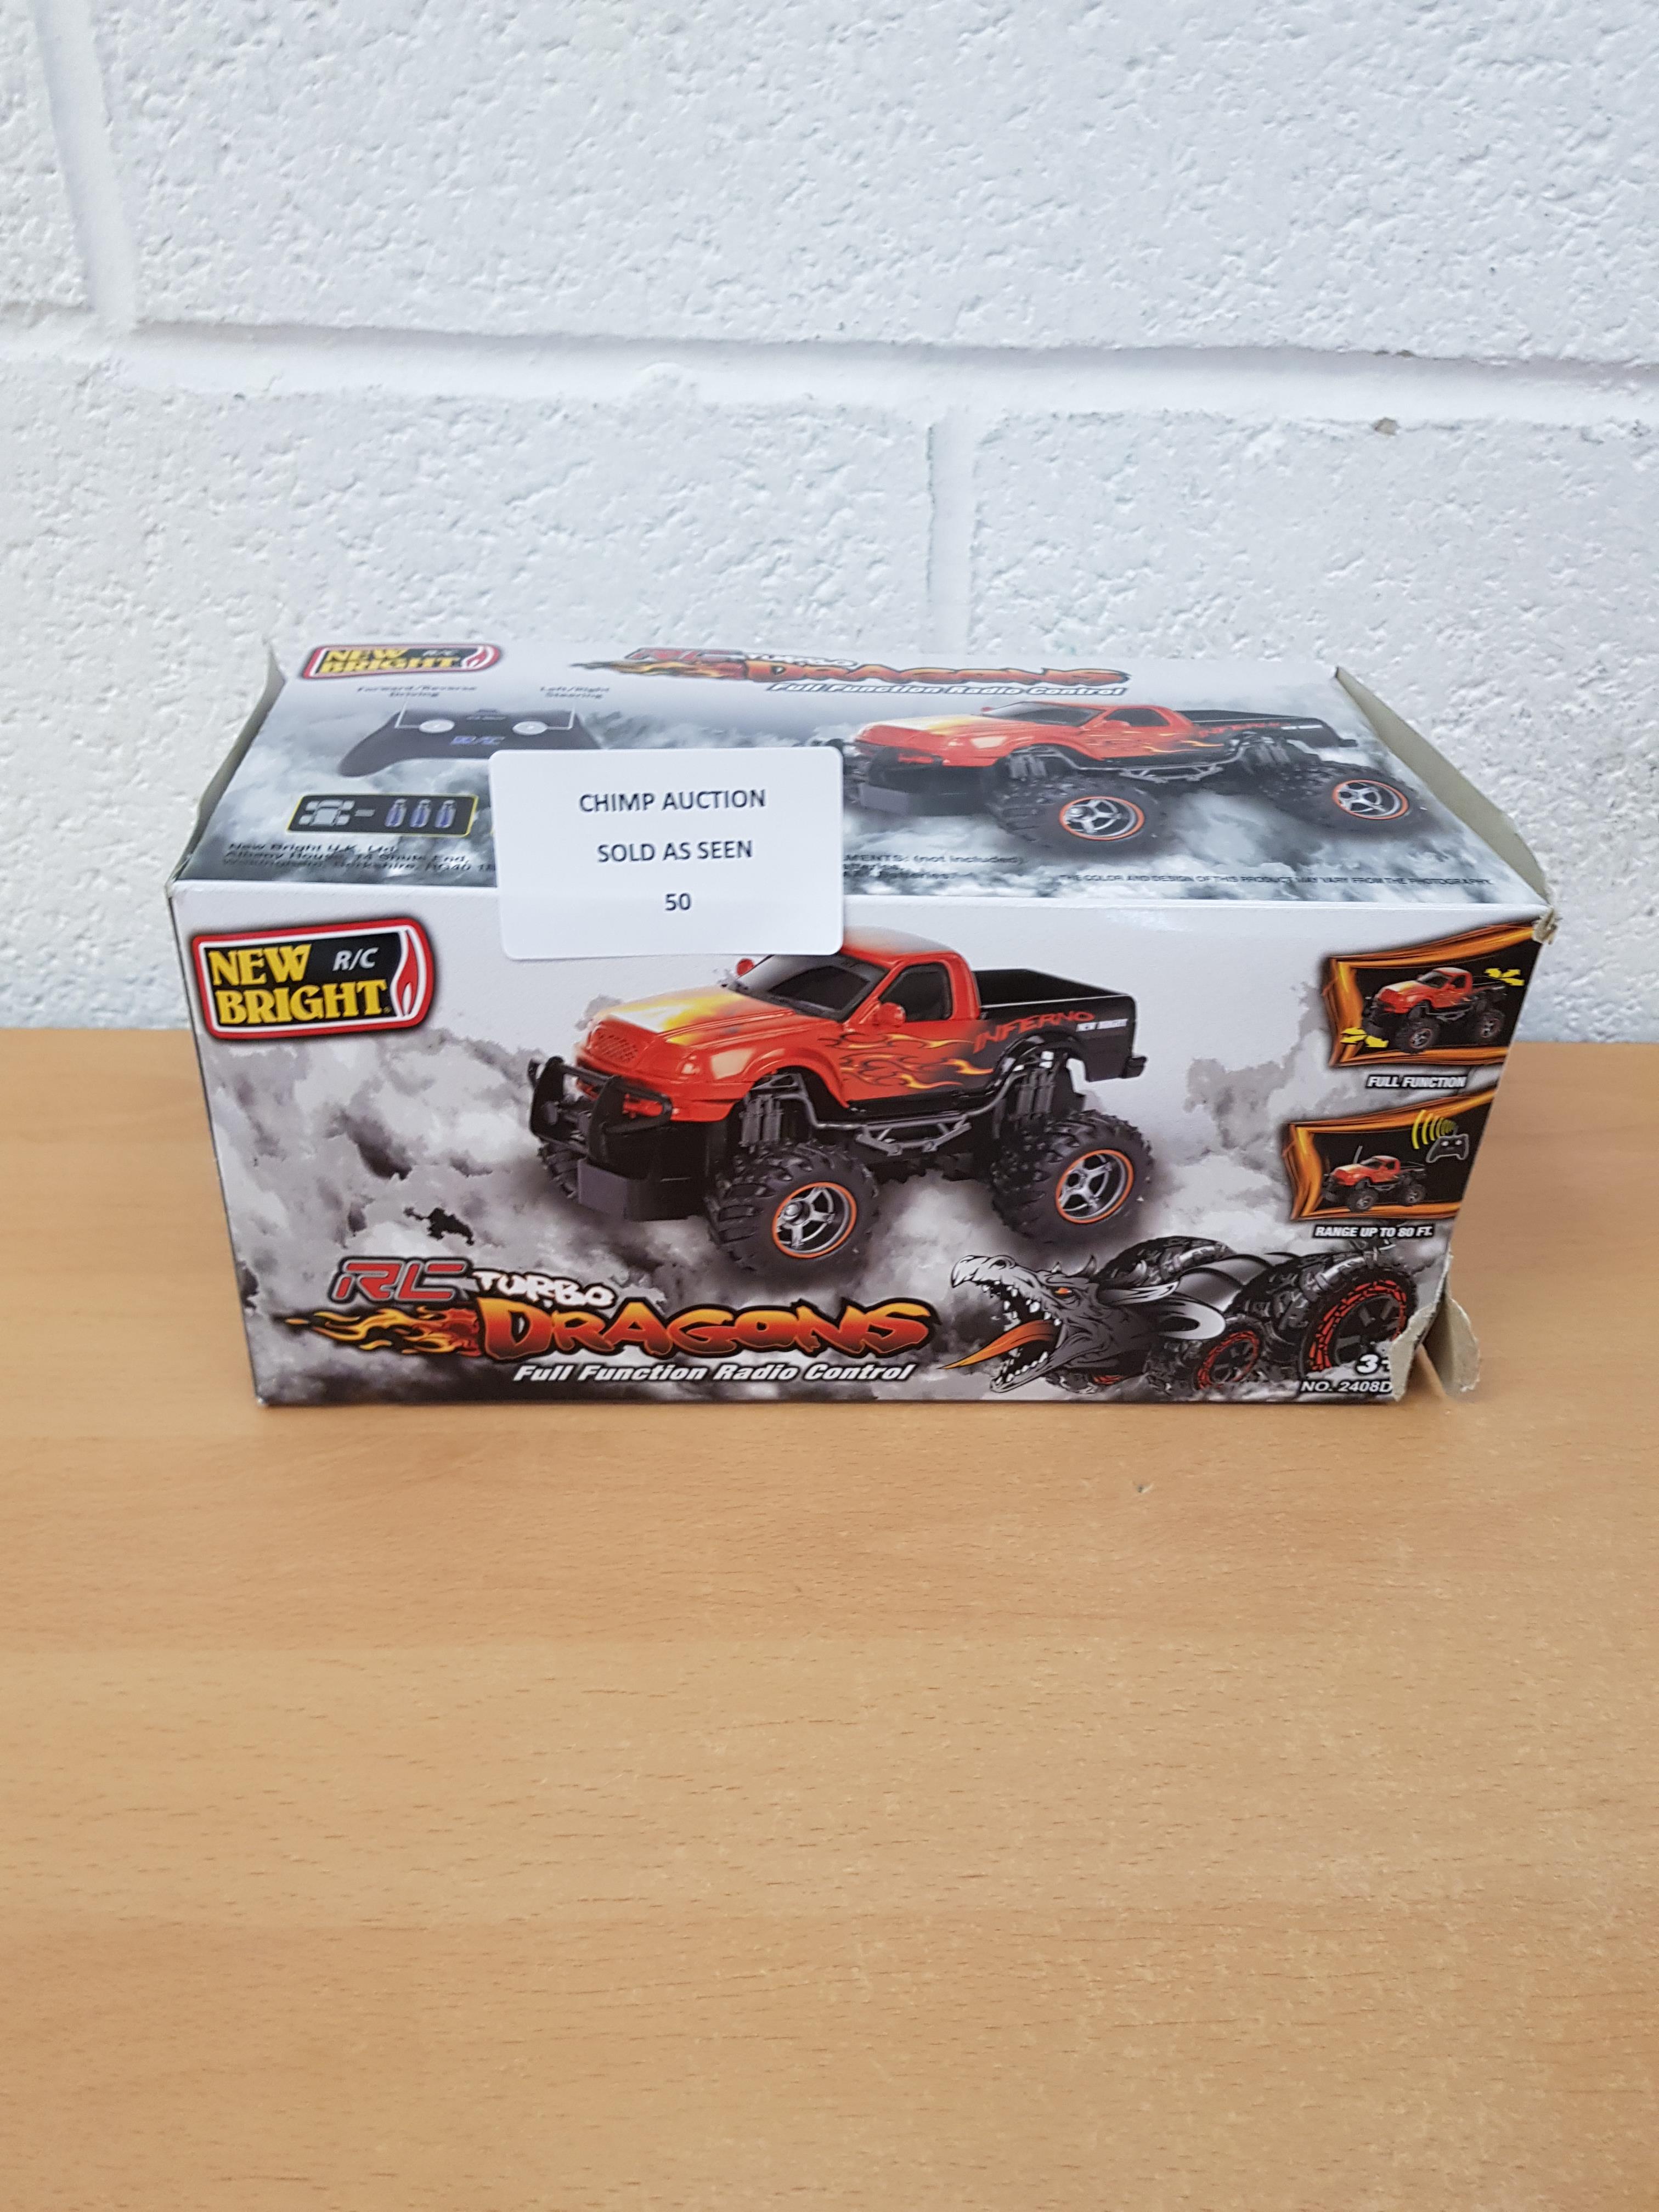 Lot 50 - N- Bright RC Turbo Dragons Radio Remote Control Car Truck Inferno